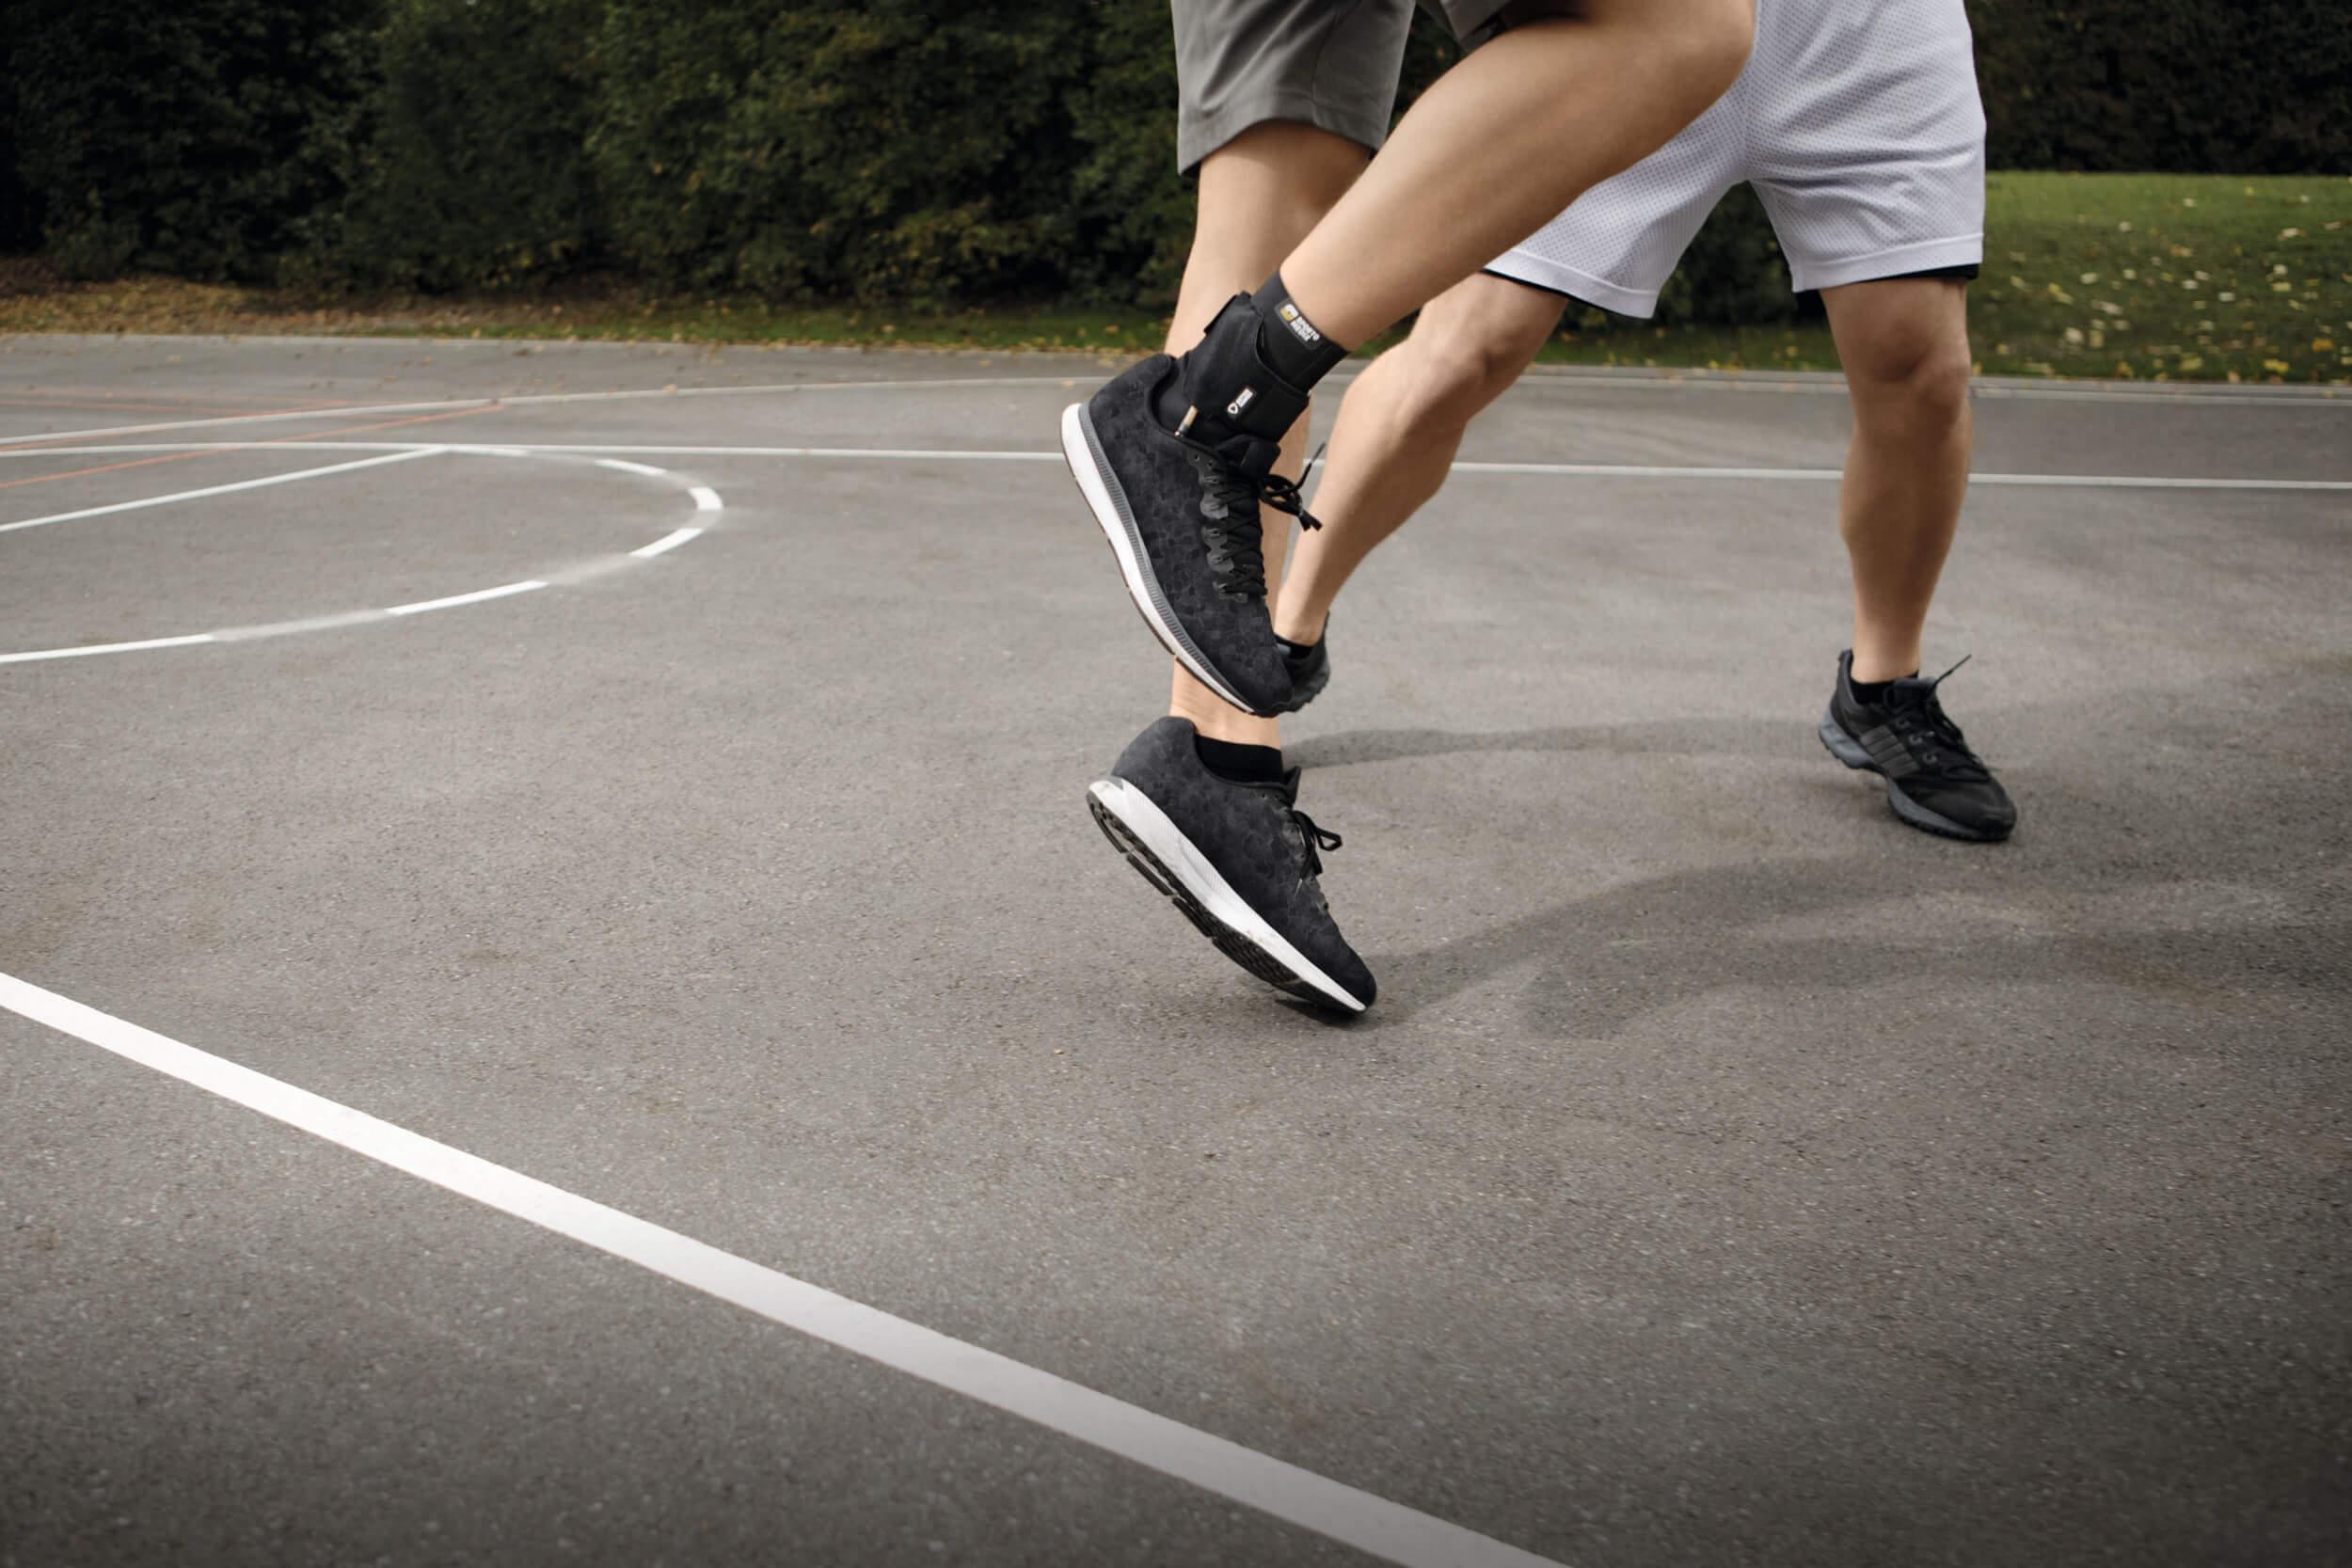 fastprotect malleo sprunggelenkbandage gegen umknicken basketball